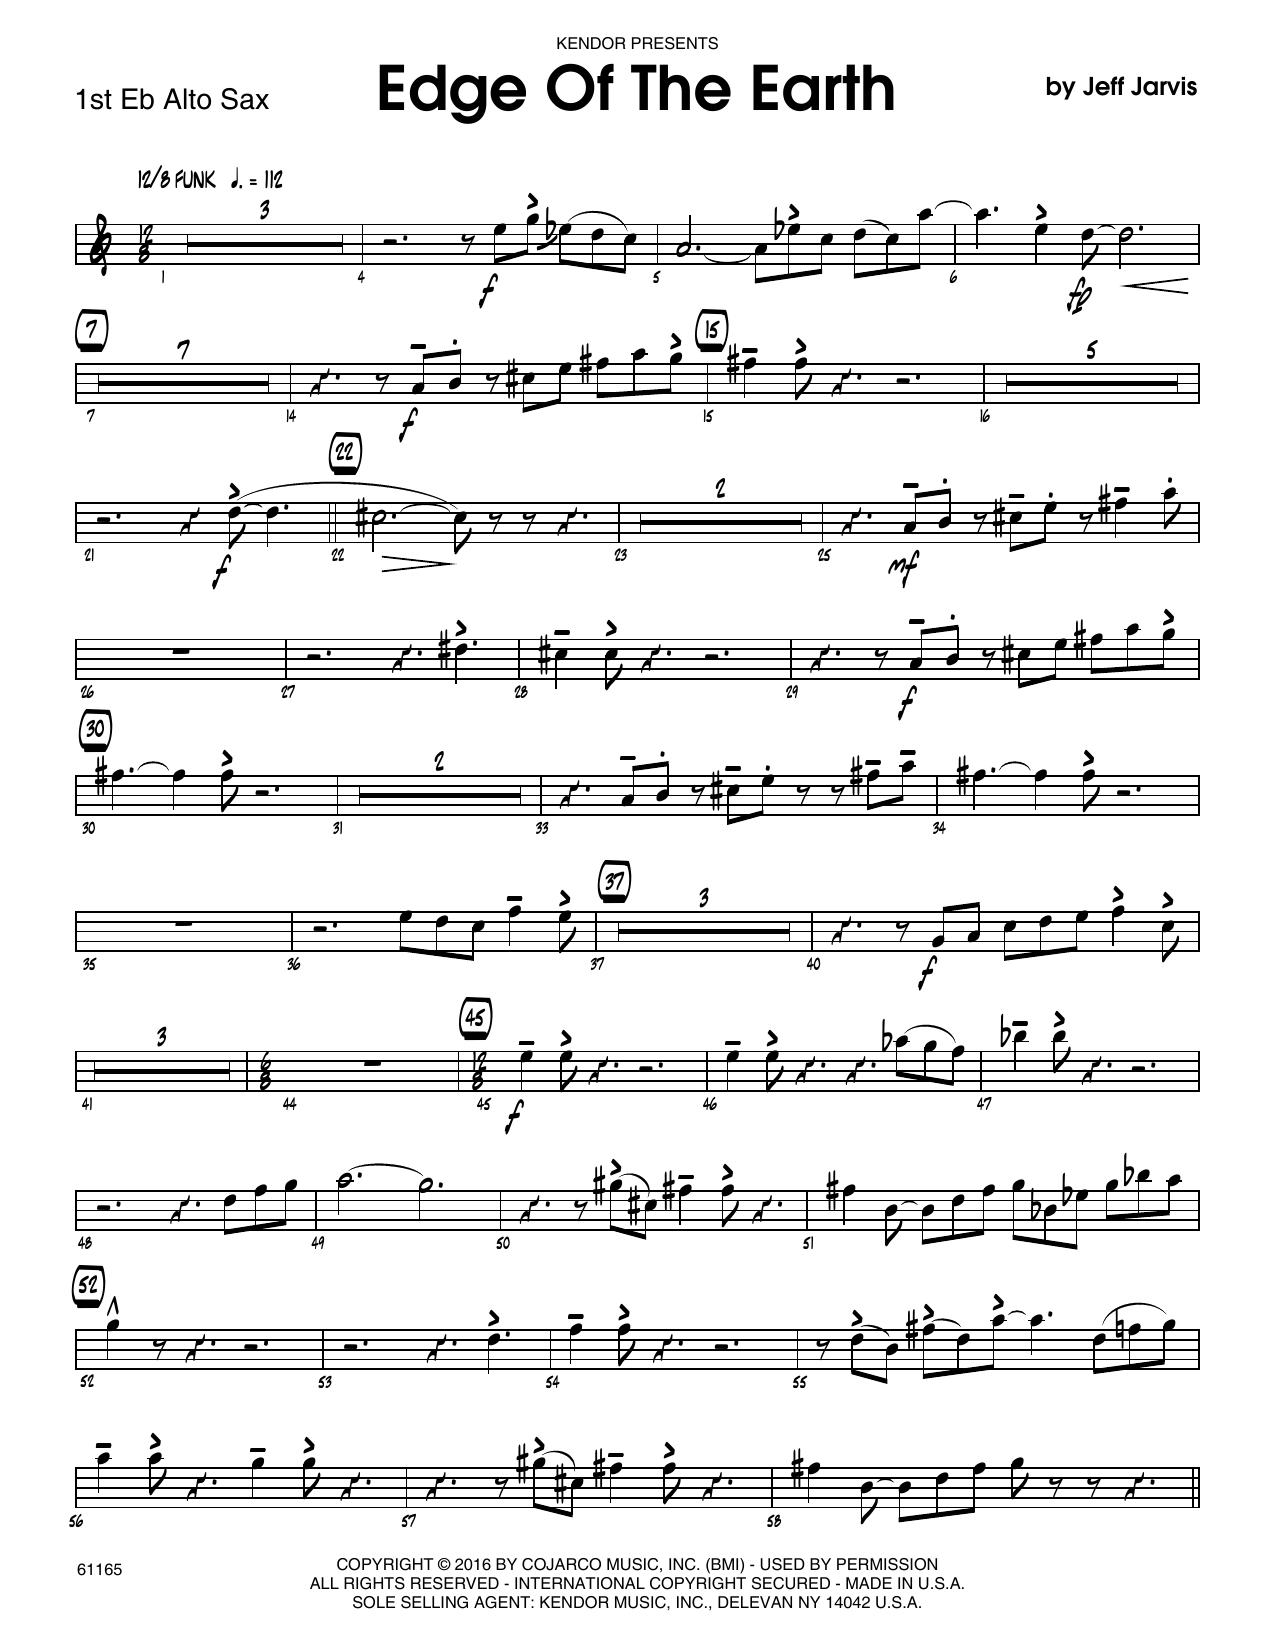 Edge Of The Earth - 1st Eb Alto Saxophone Sheet Music